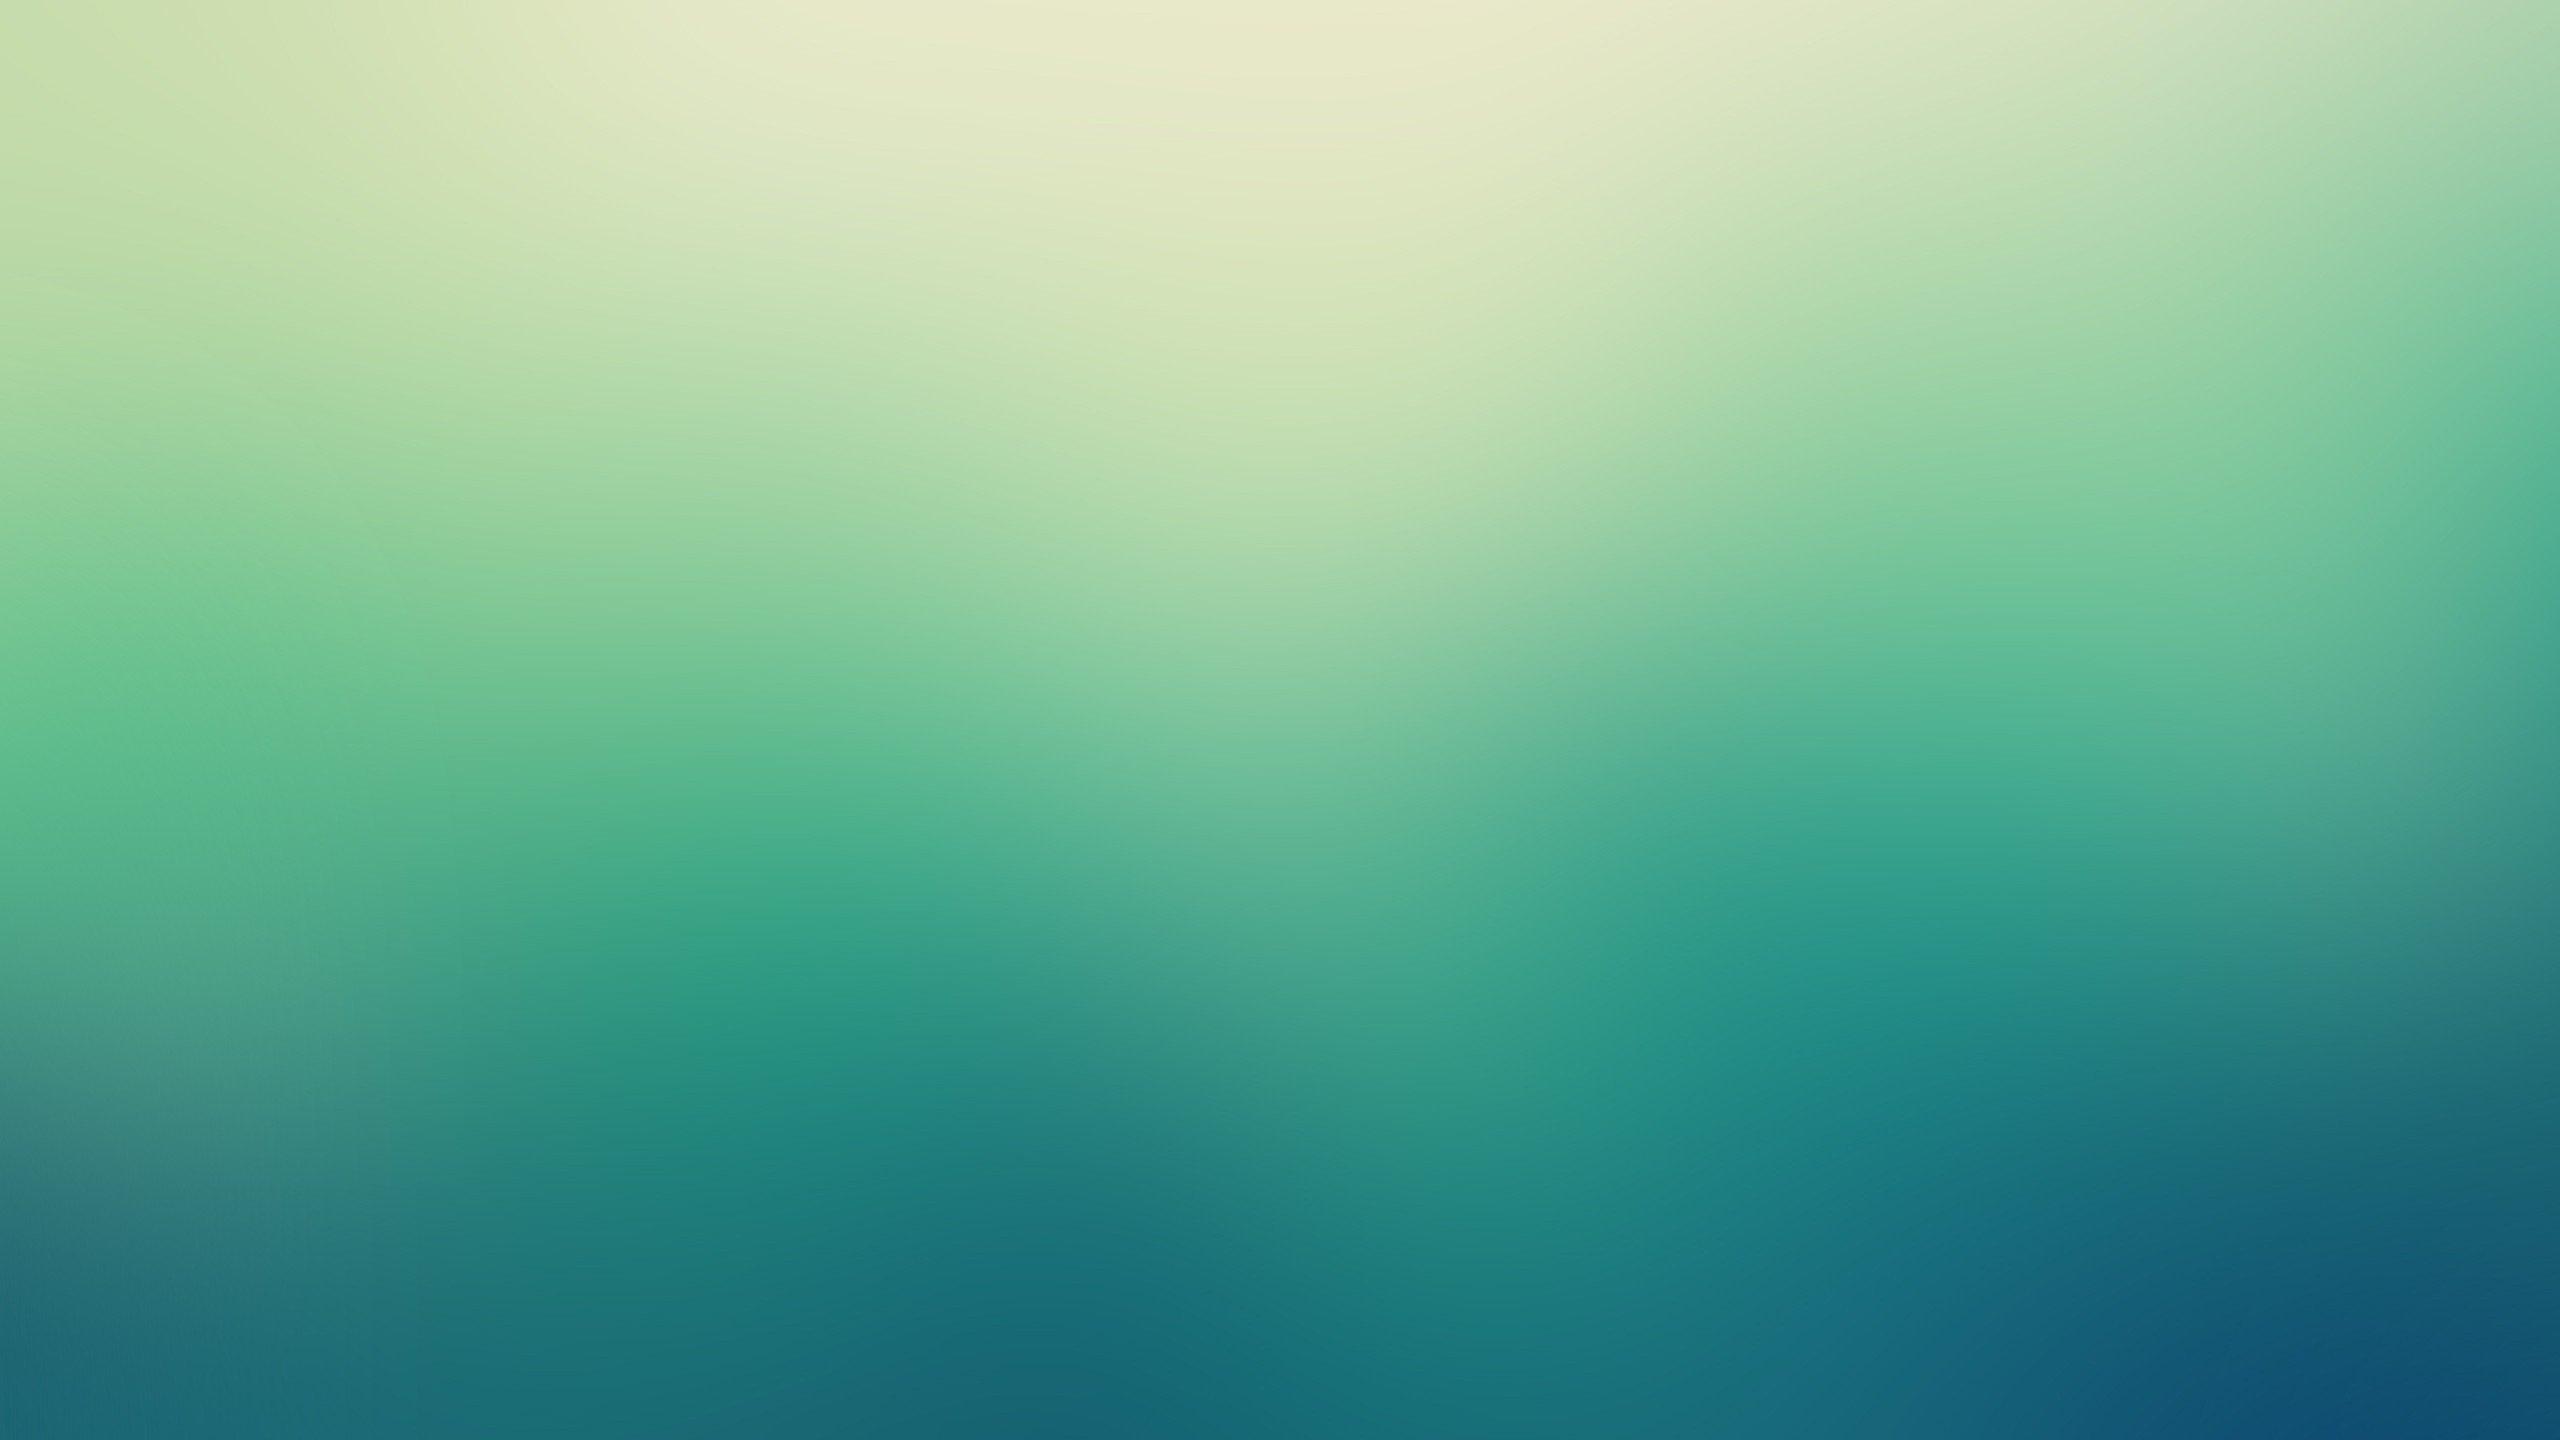 Fond Décran 2560x1440 Px Bleu Pente Simple Blanc